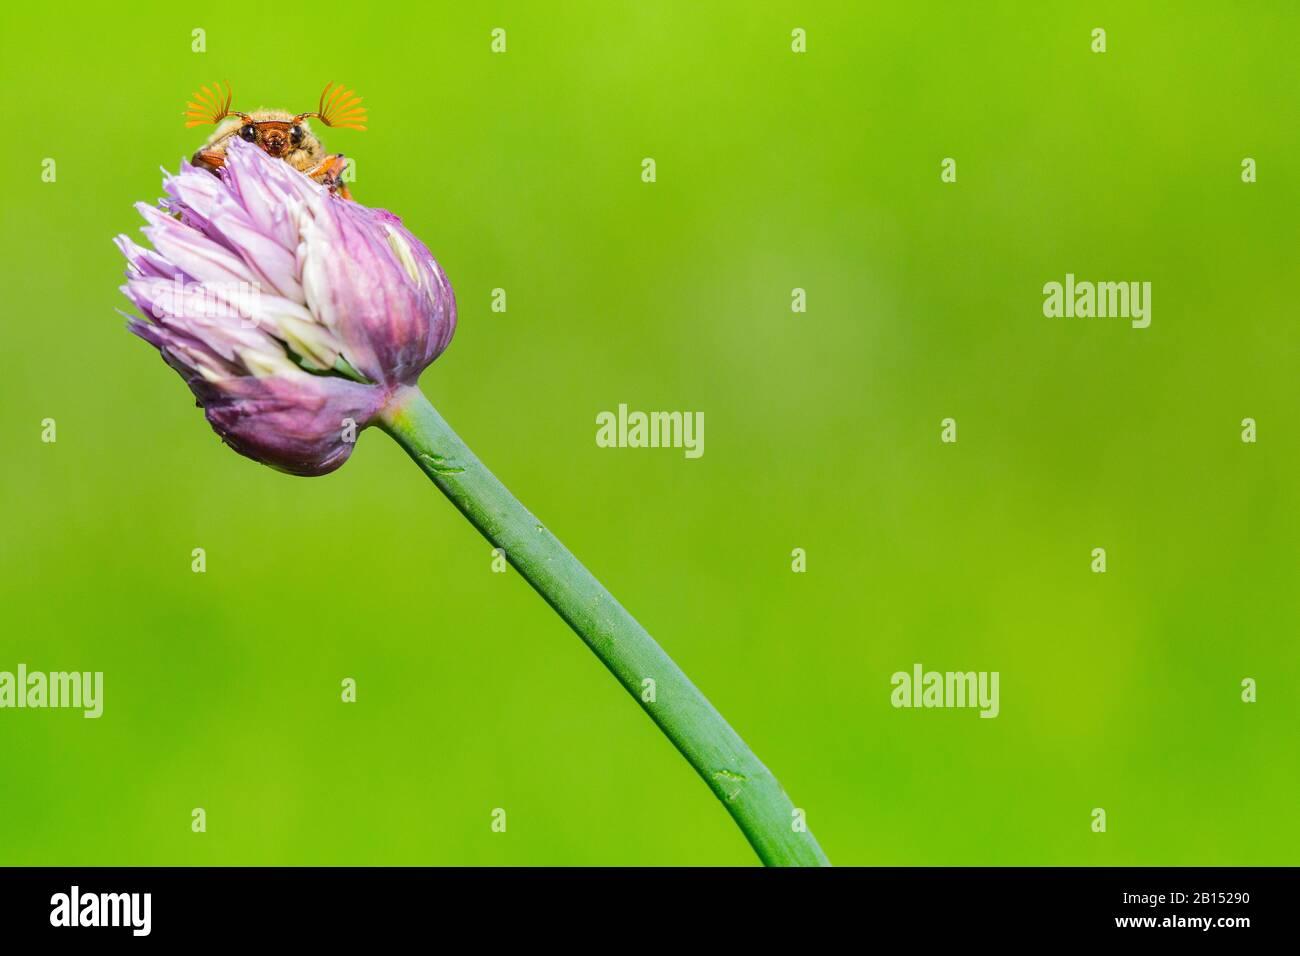 Common cockchafer, Maybug, Maybeetle (Melolontha melolontha), on Allium, Netherlands, Frisia, Delleboersterheide Stock Photo